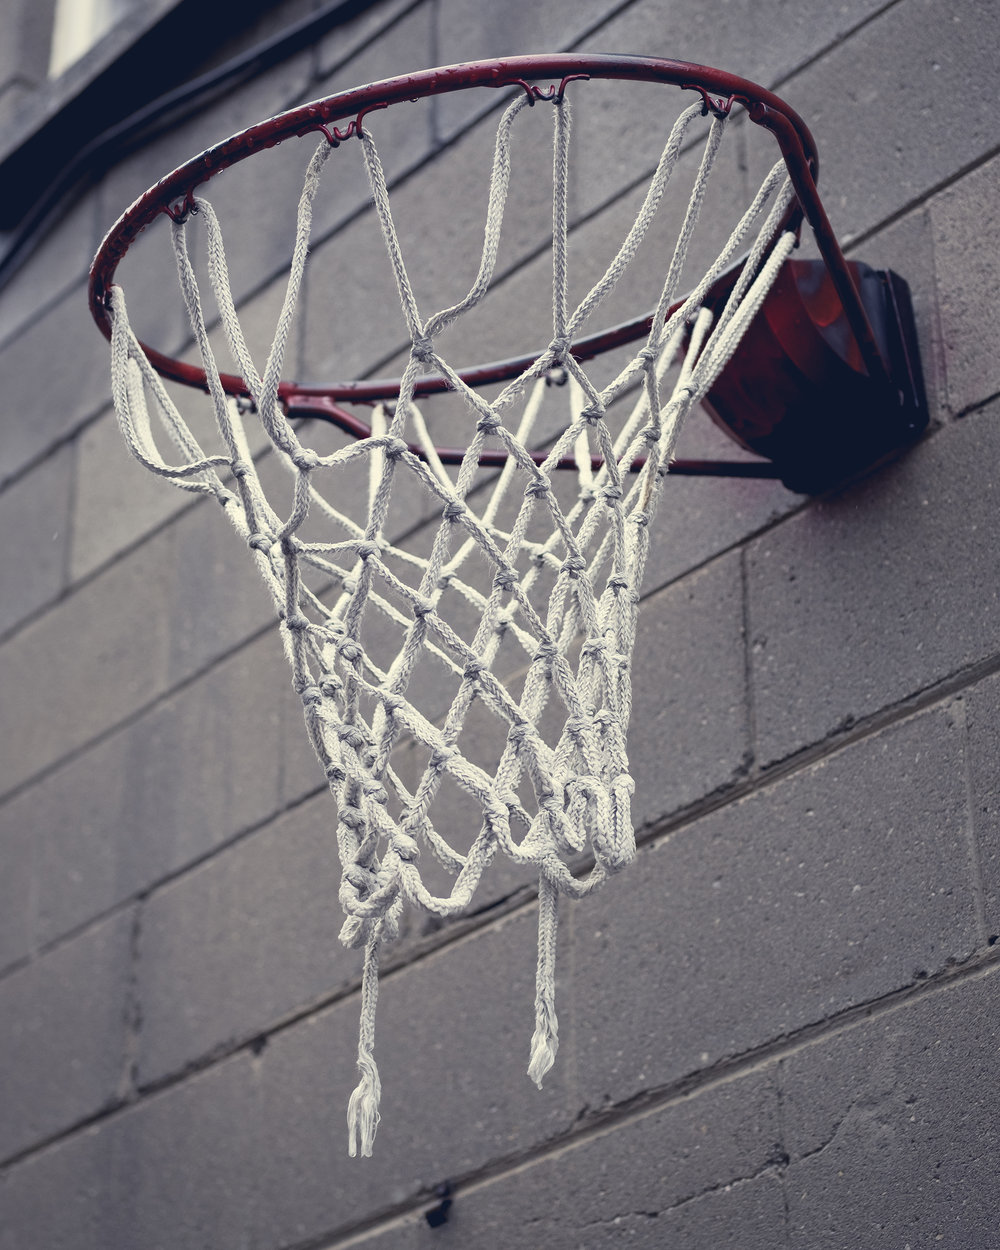 Alley Basketball.jpg